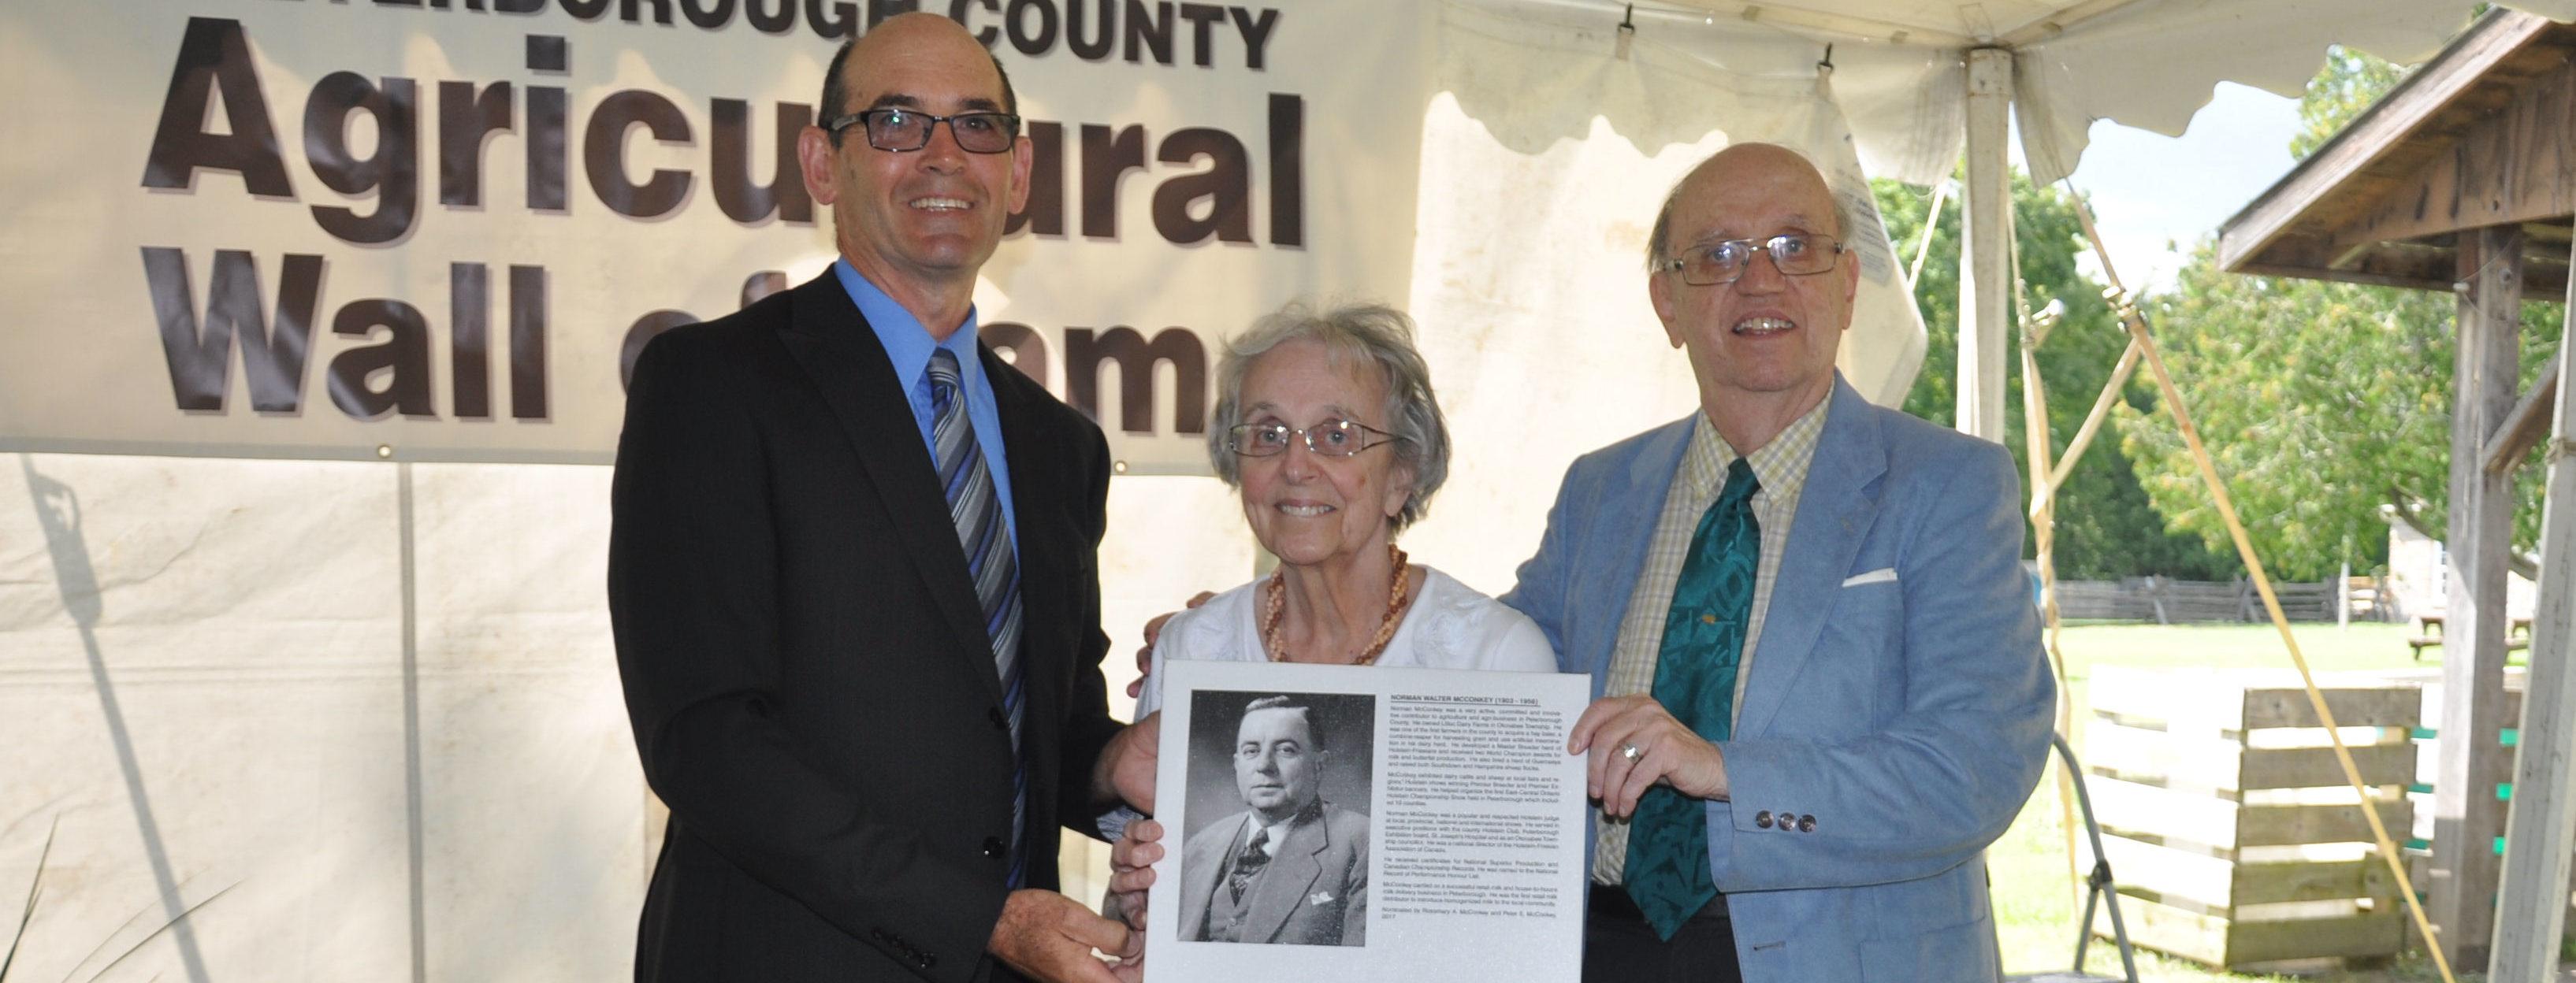 Wayne Warner, Rosemary McConkey, Peter E McConkey